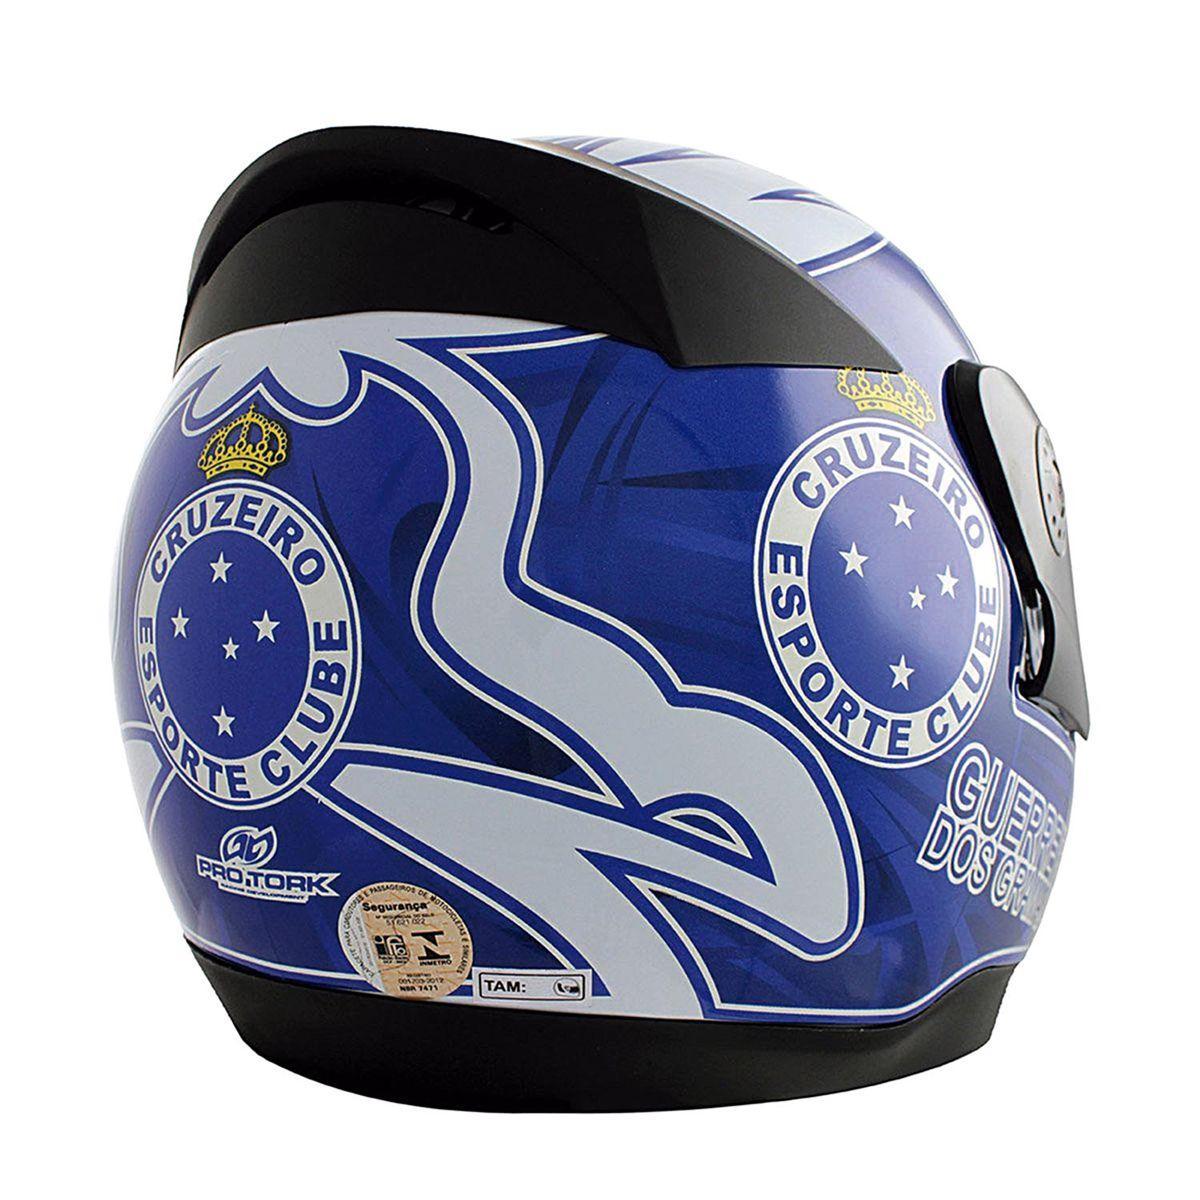 a30a830514 Capacete Liberty Evolution 3g Do Cruzeiro Pro Tork - Capacetes ...